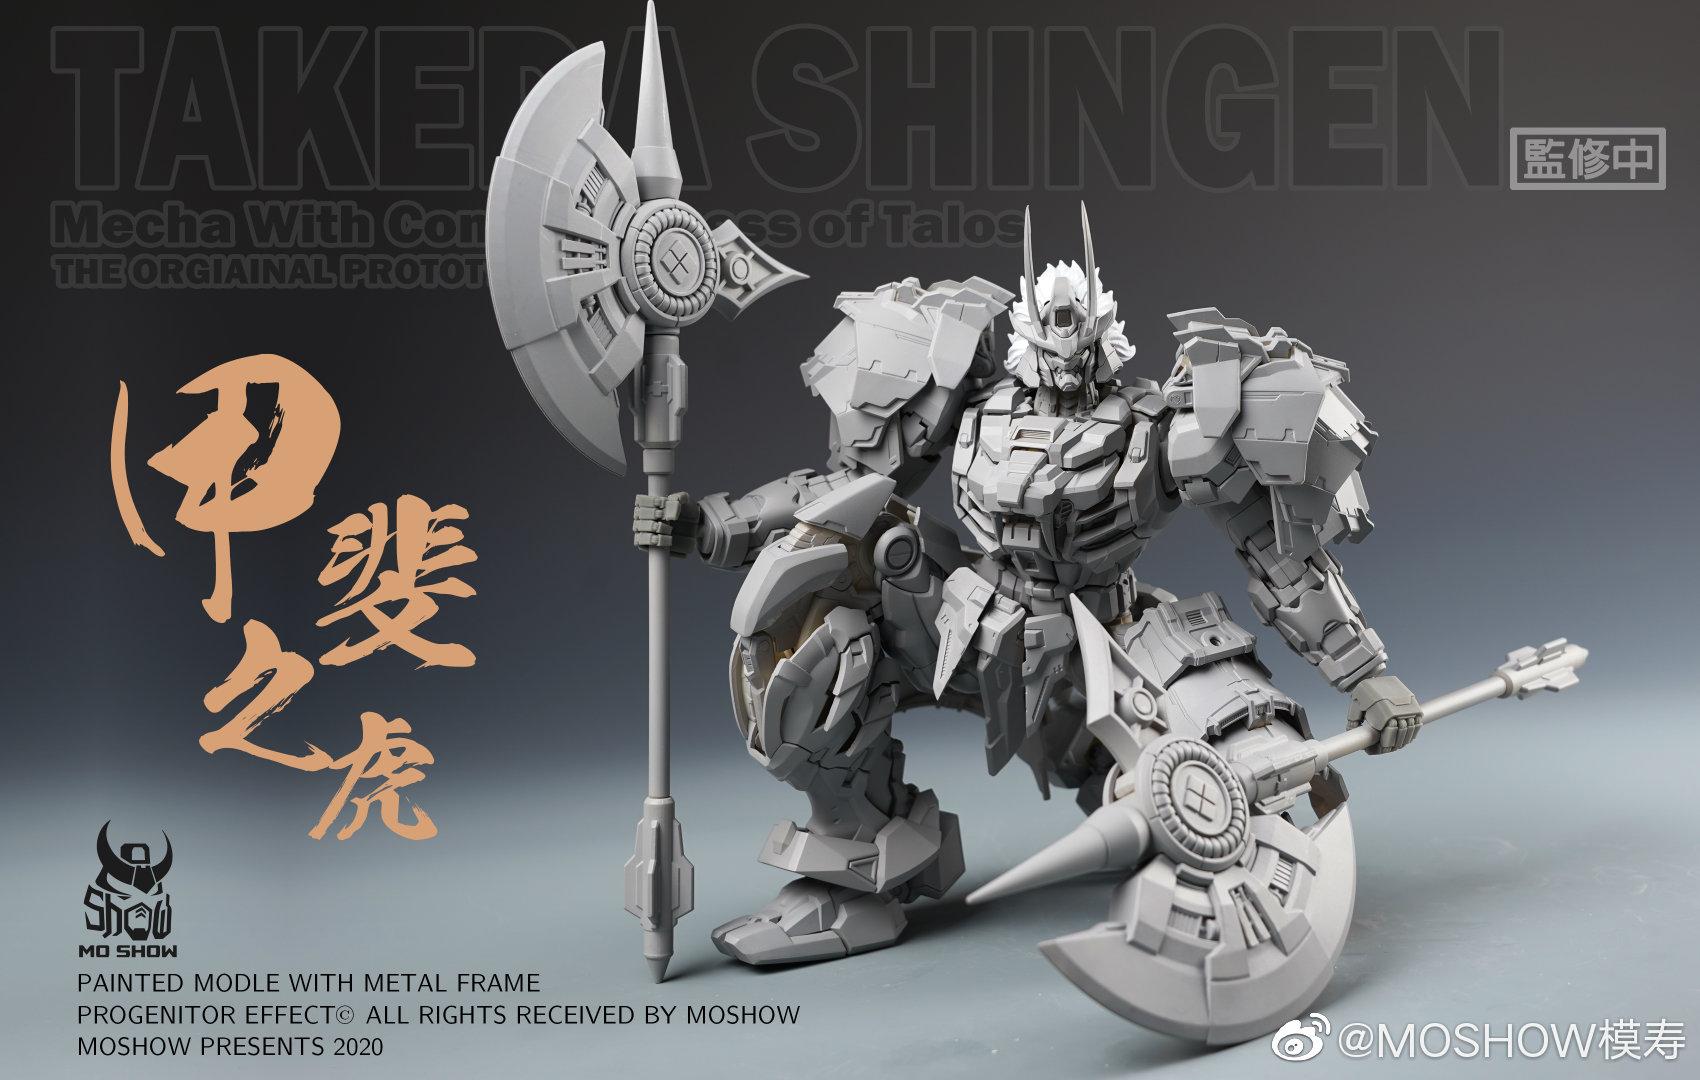 S504_MO_SHOW_takeda_shingen_012.jpg